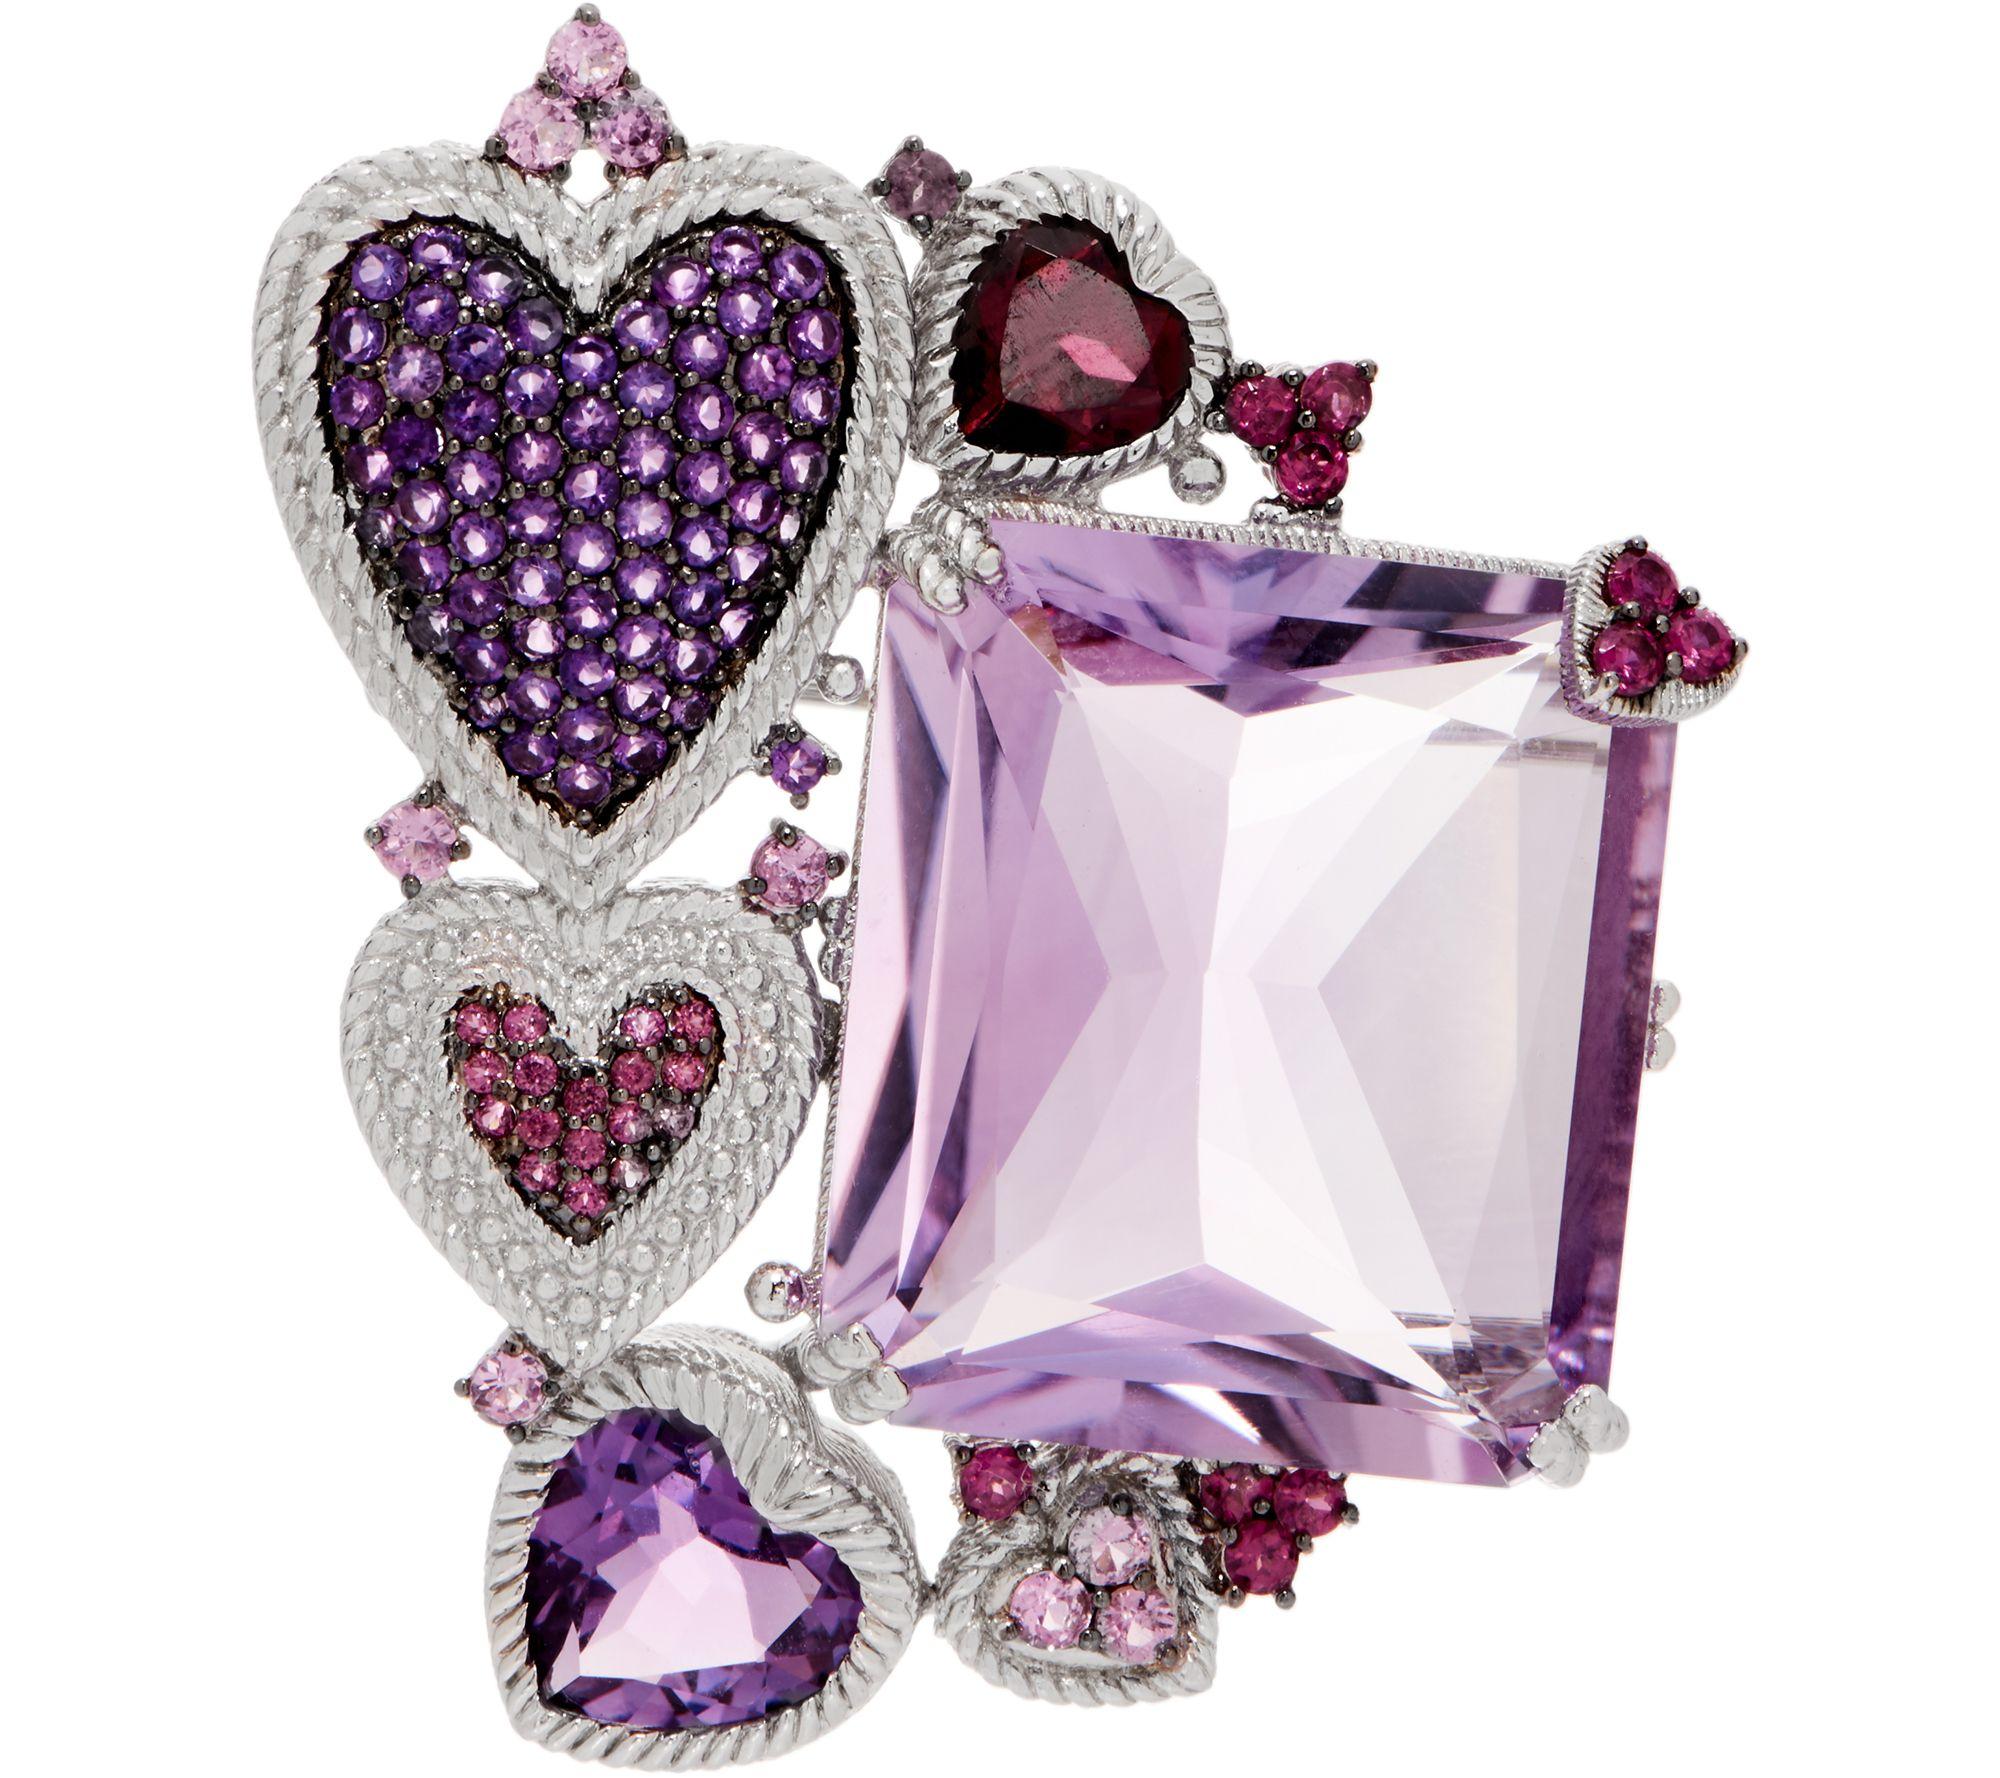 9775f1068d21b Judith Ripka Sterling Silver 41.45 cttw Gemstone Heart Pin/Enhancer —  QVC.com